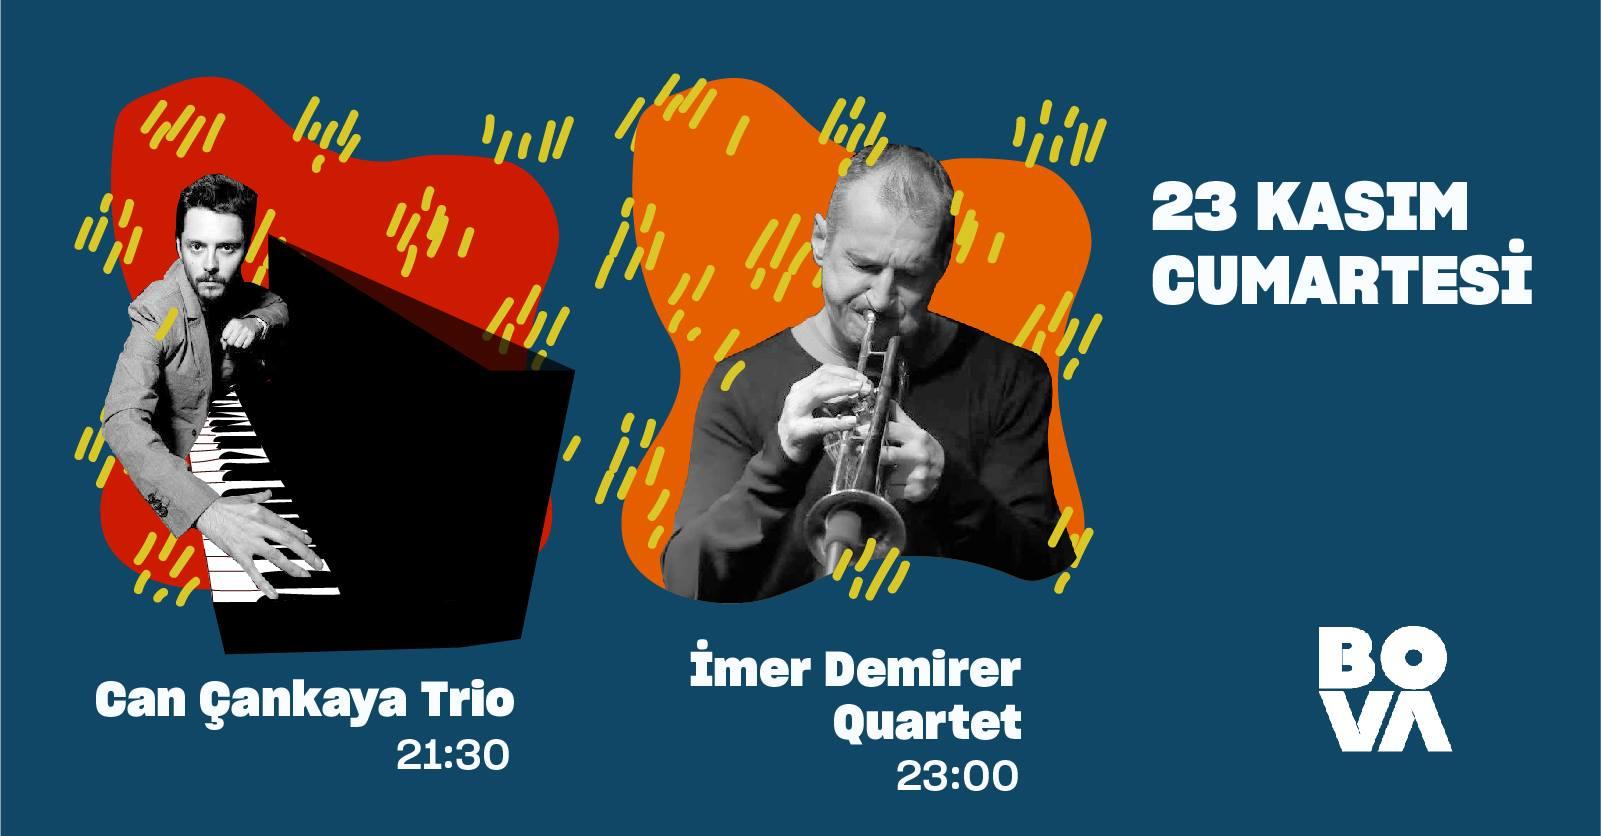 Can Çankaya Trio 21:30 & İmer Demirer Quartet 23:00